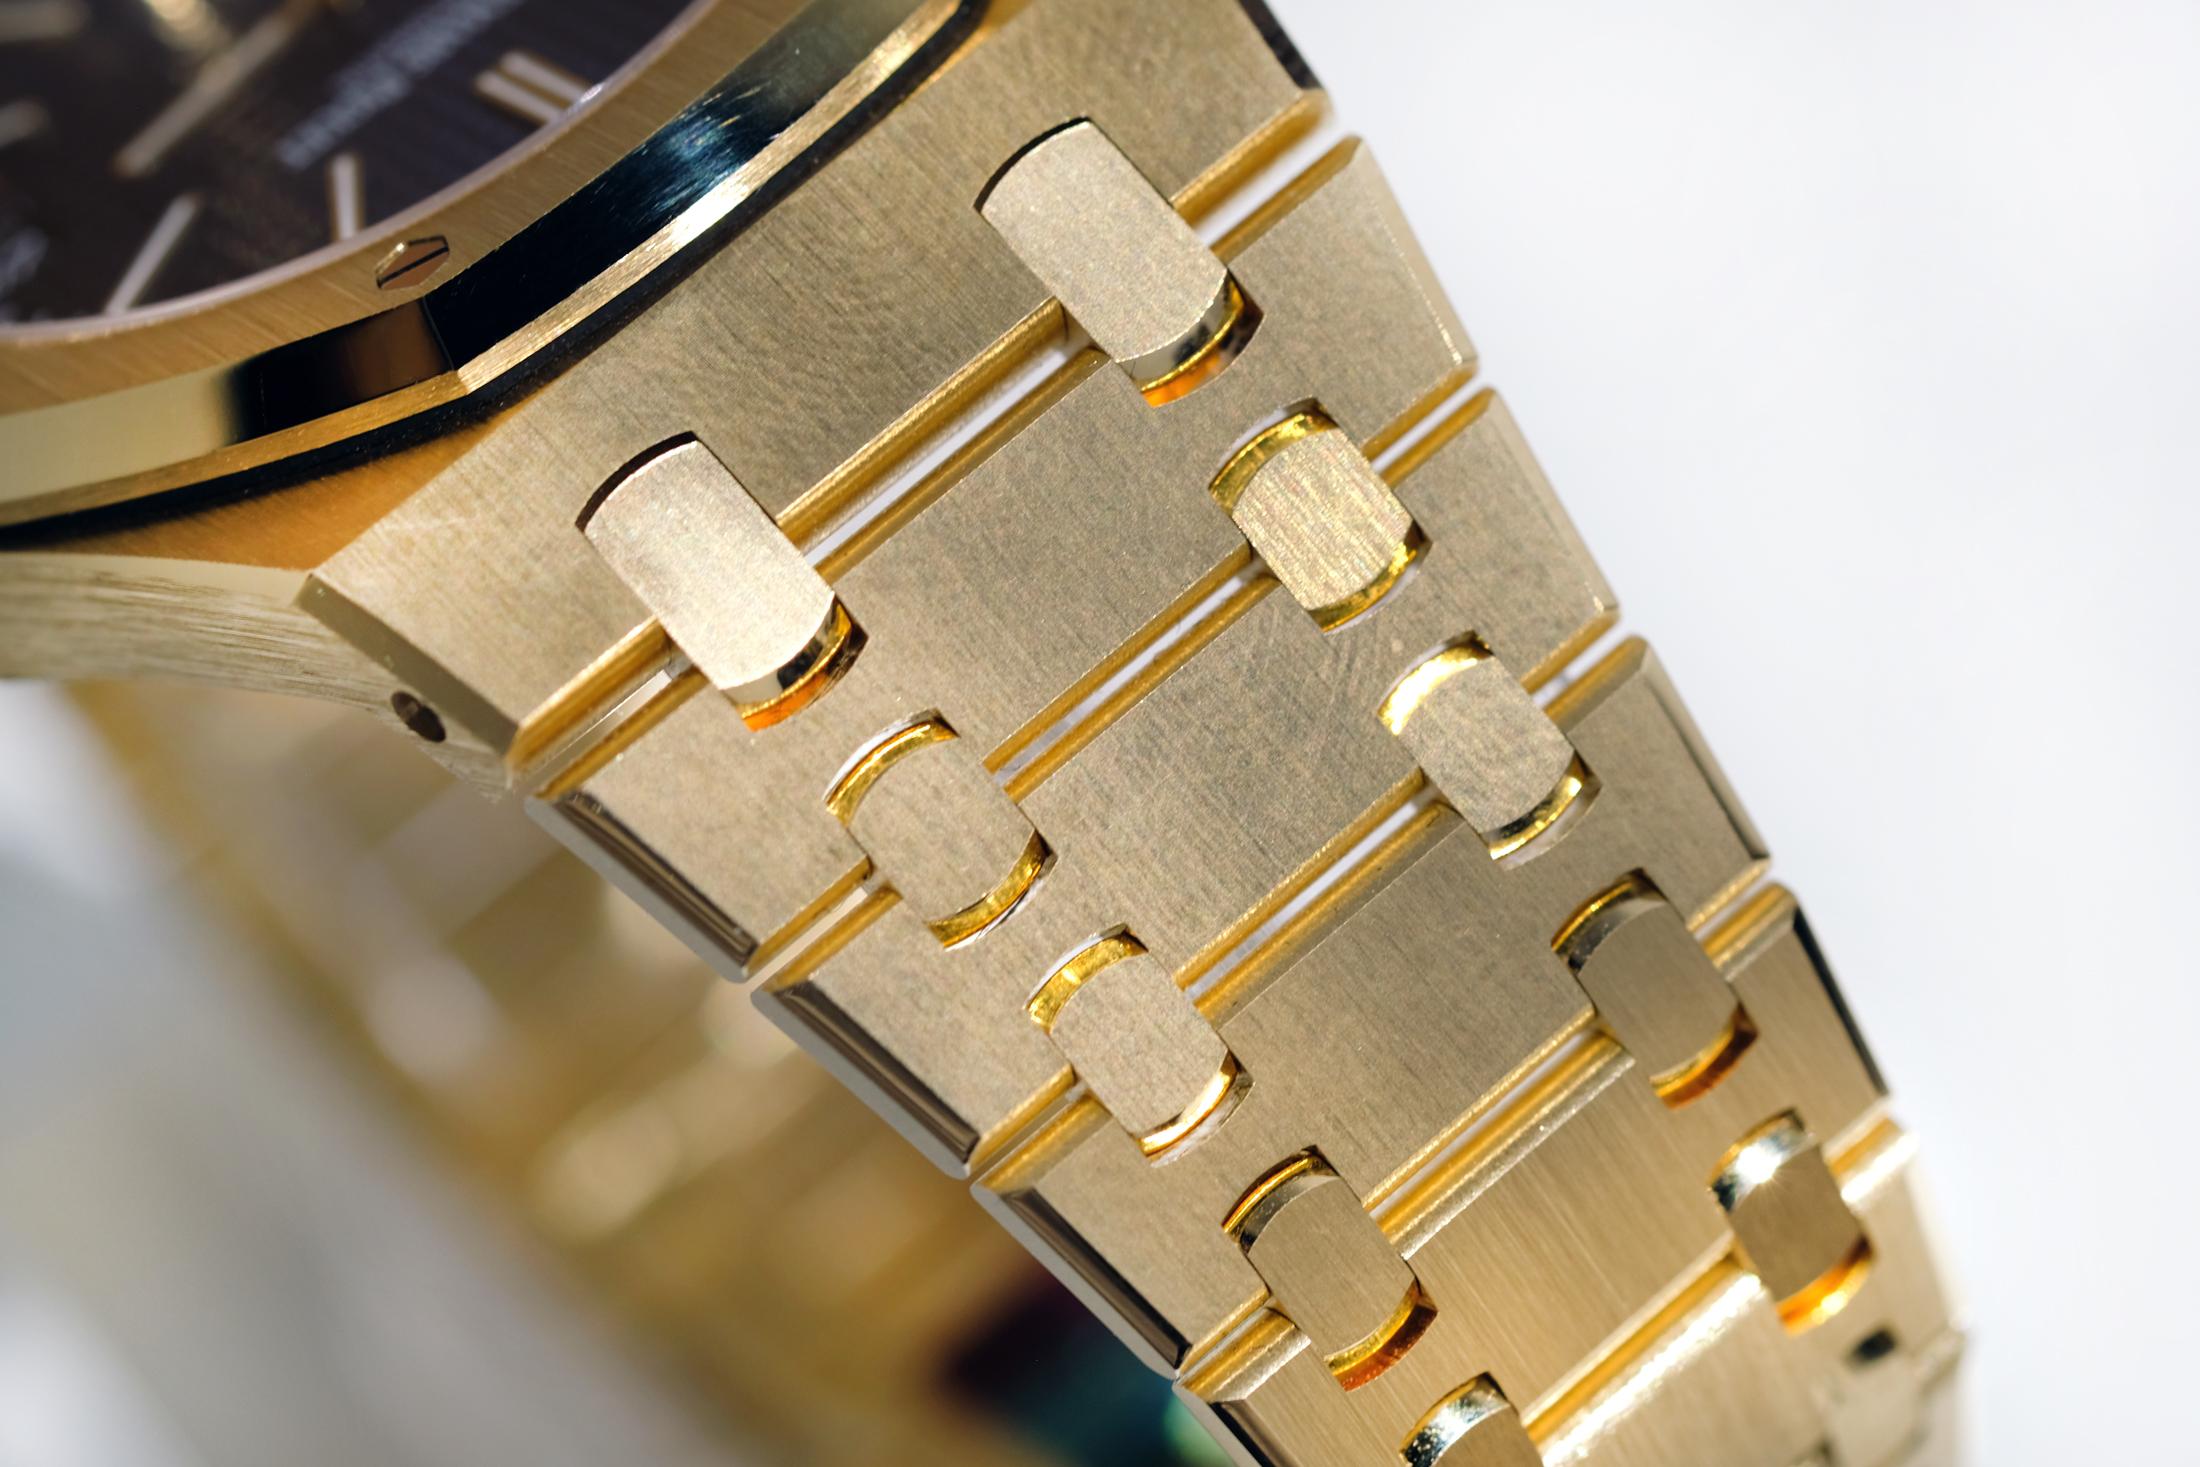 audemars-piguet-royaloak-15202-maulti-link-bracelet-yellow-gold